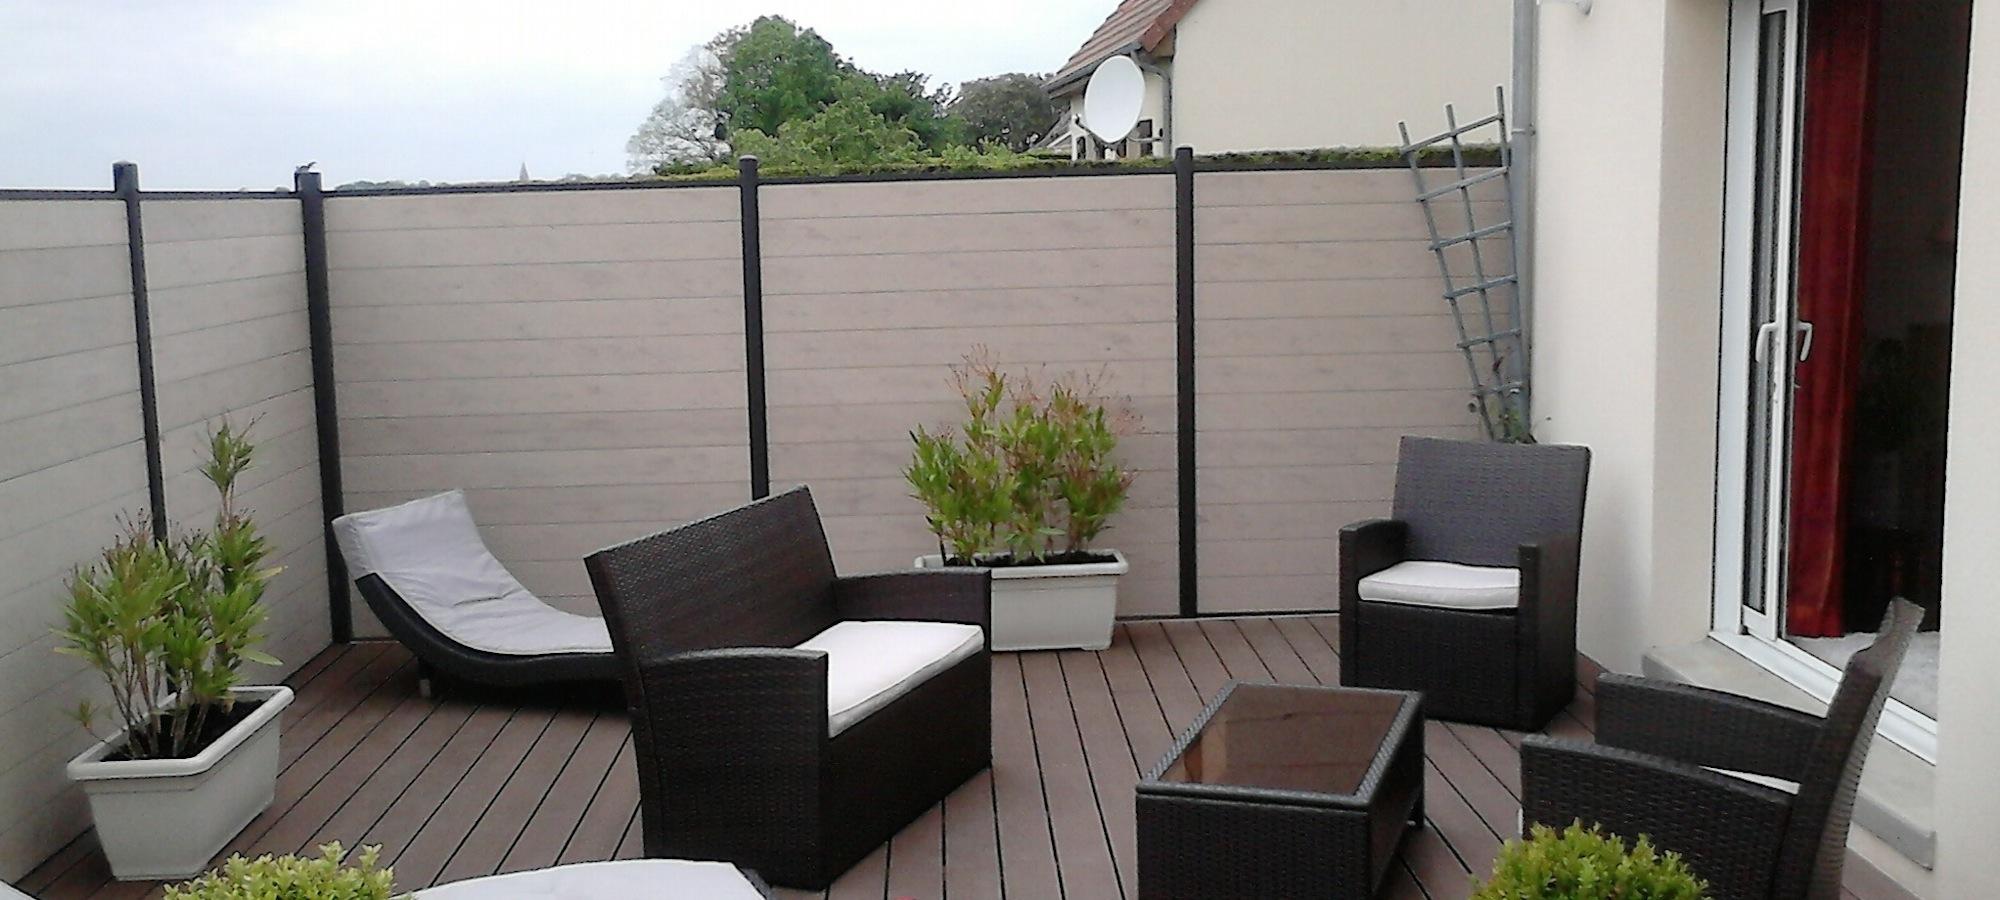 terrasse composite prix belgique nos conseils. Black Bedroom Furniture Sets. Home Design Ideas